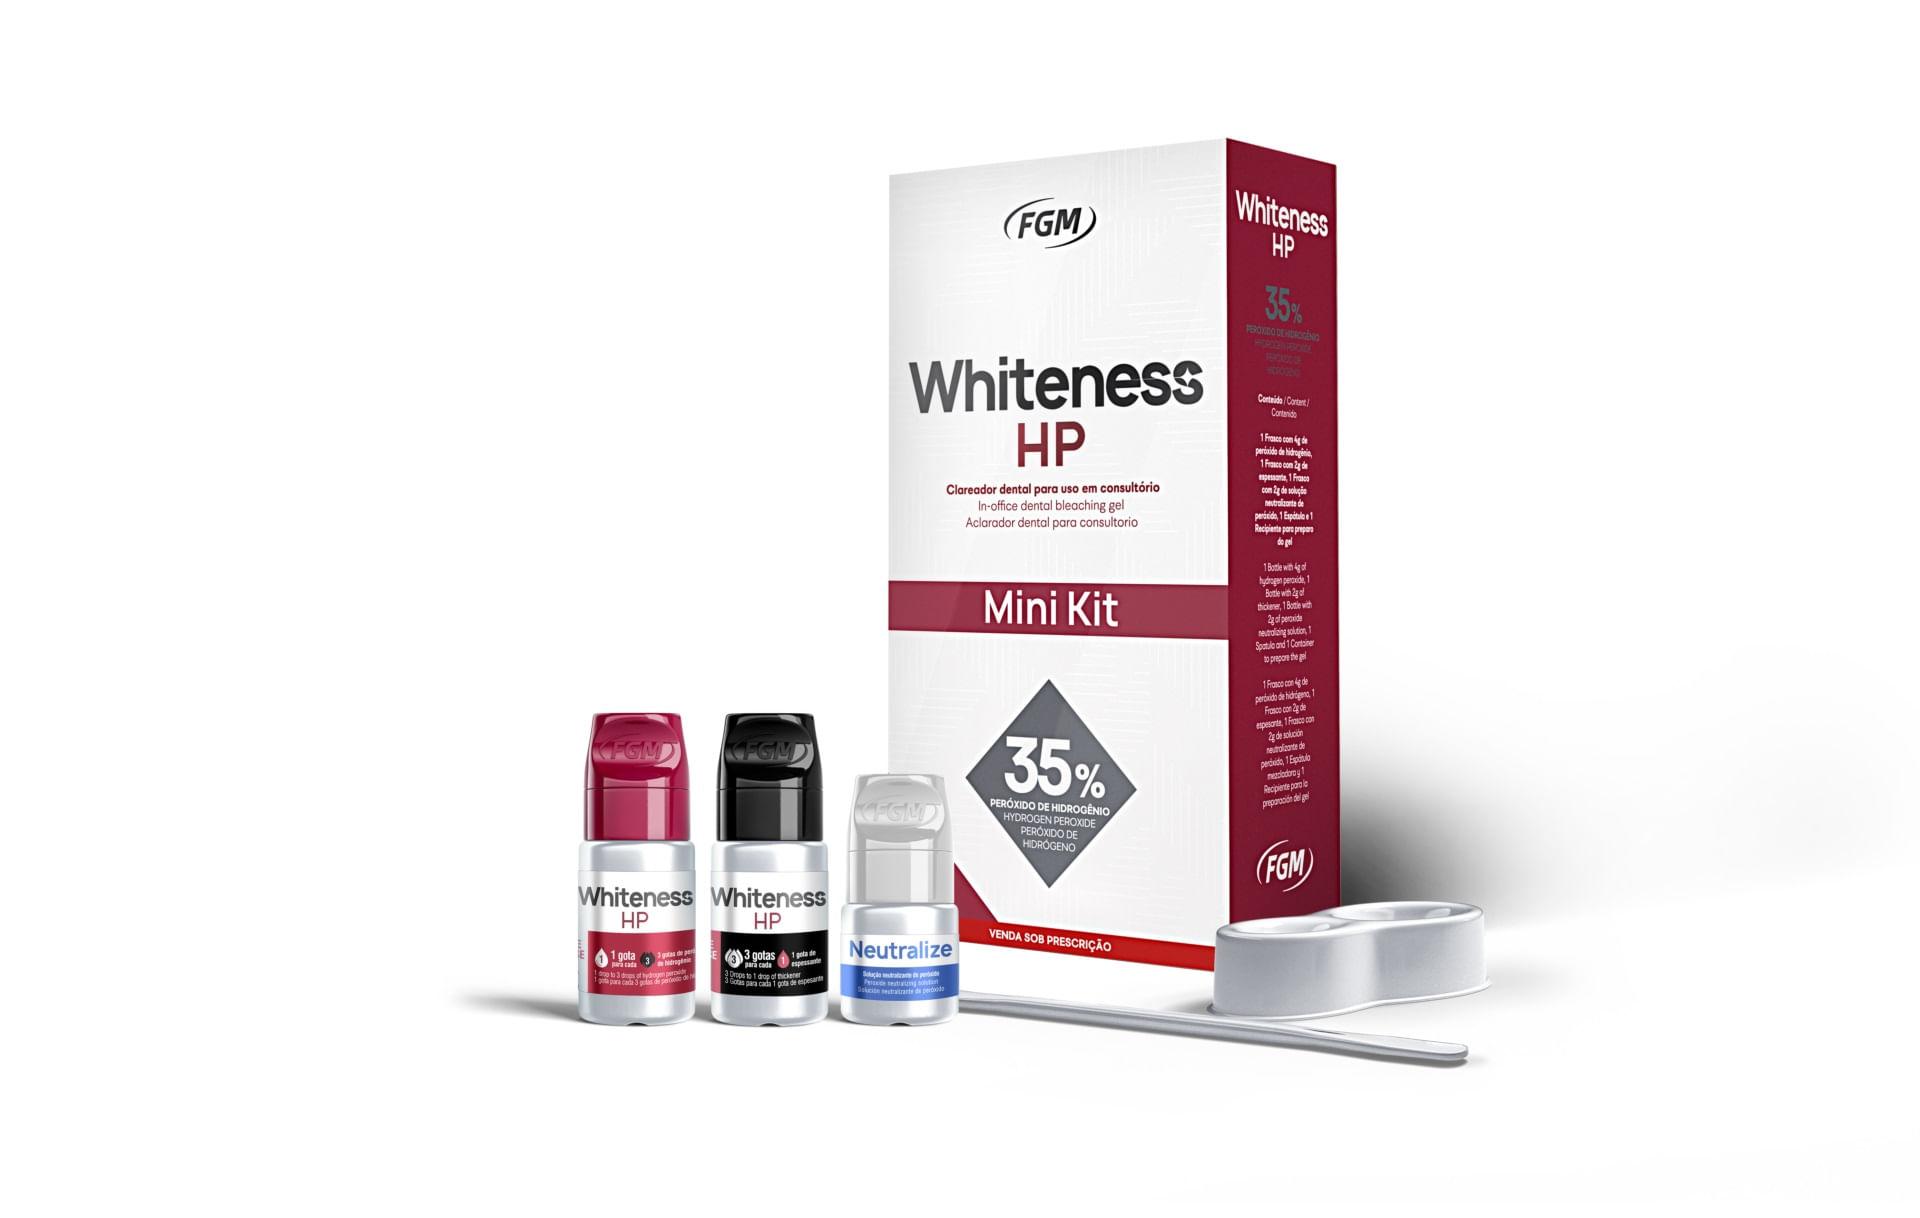 WHITENESS-HP-35----MINI-KIT-CLAREADOR-DENTAL-PARA-1-PACIENTE---FGM